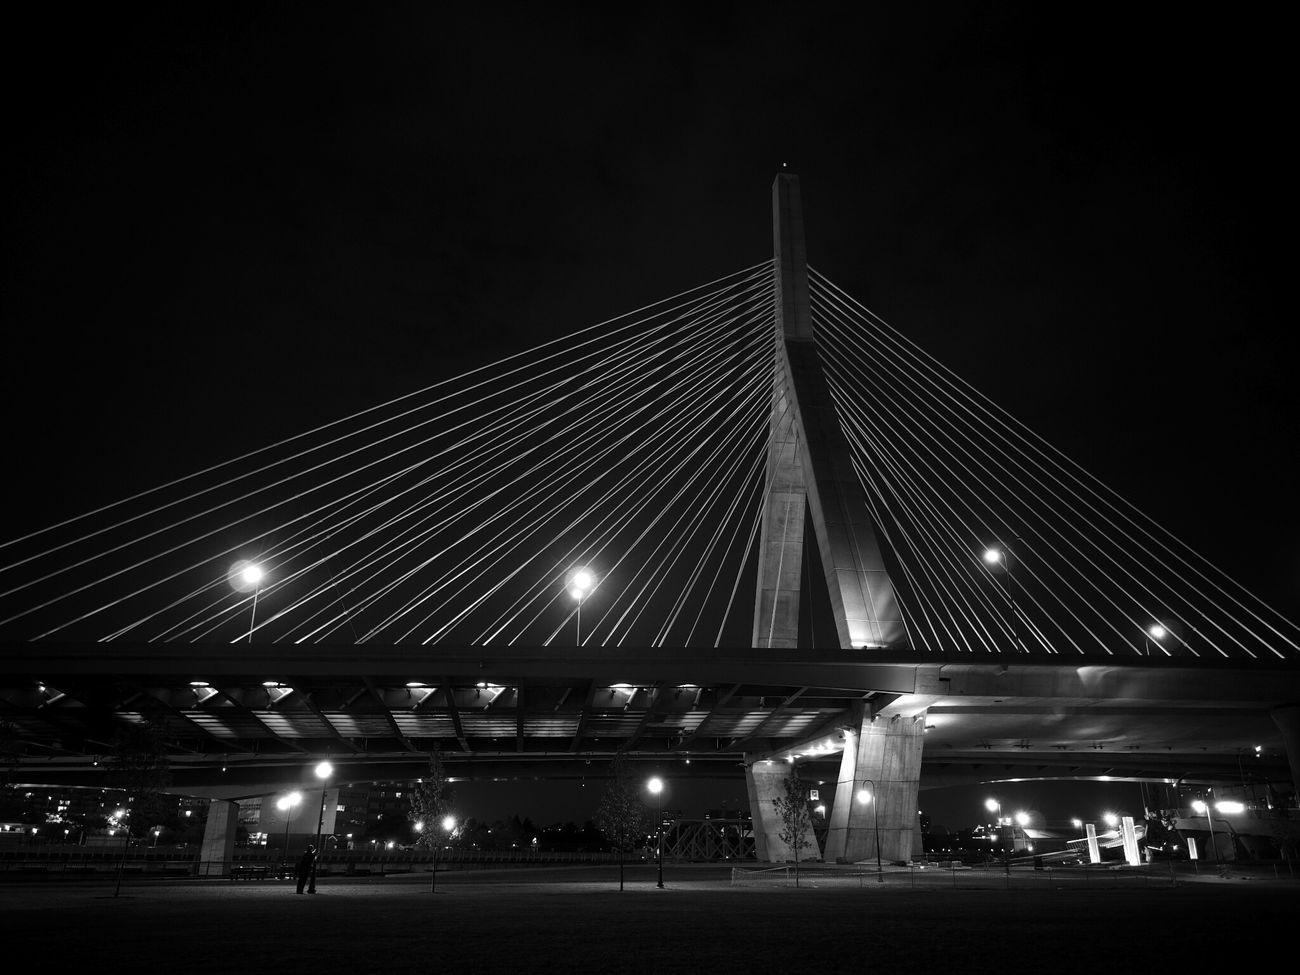 Leonard Zakim Bridge at Night in Blackandwhite